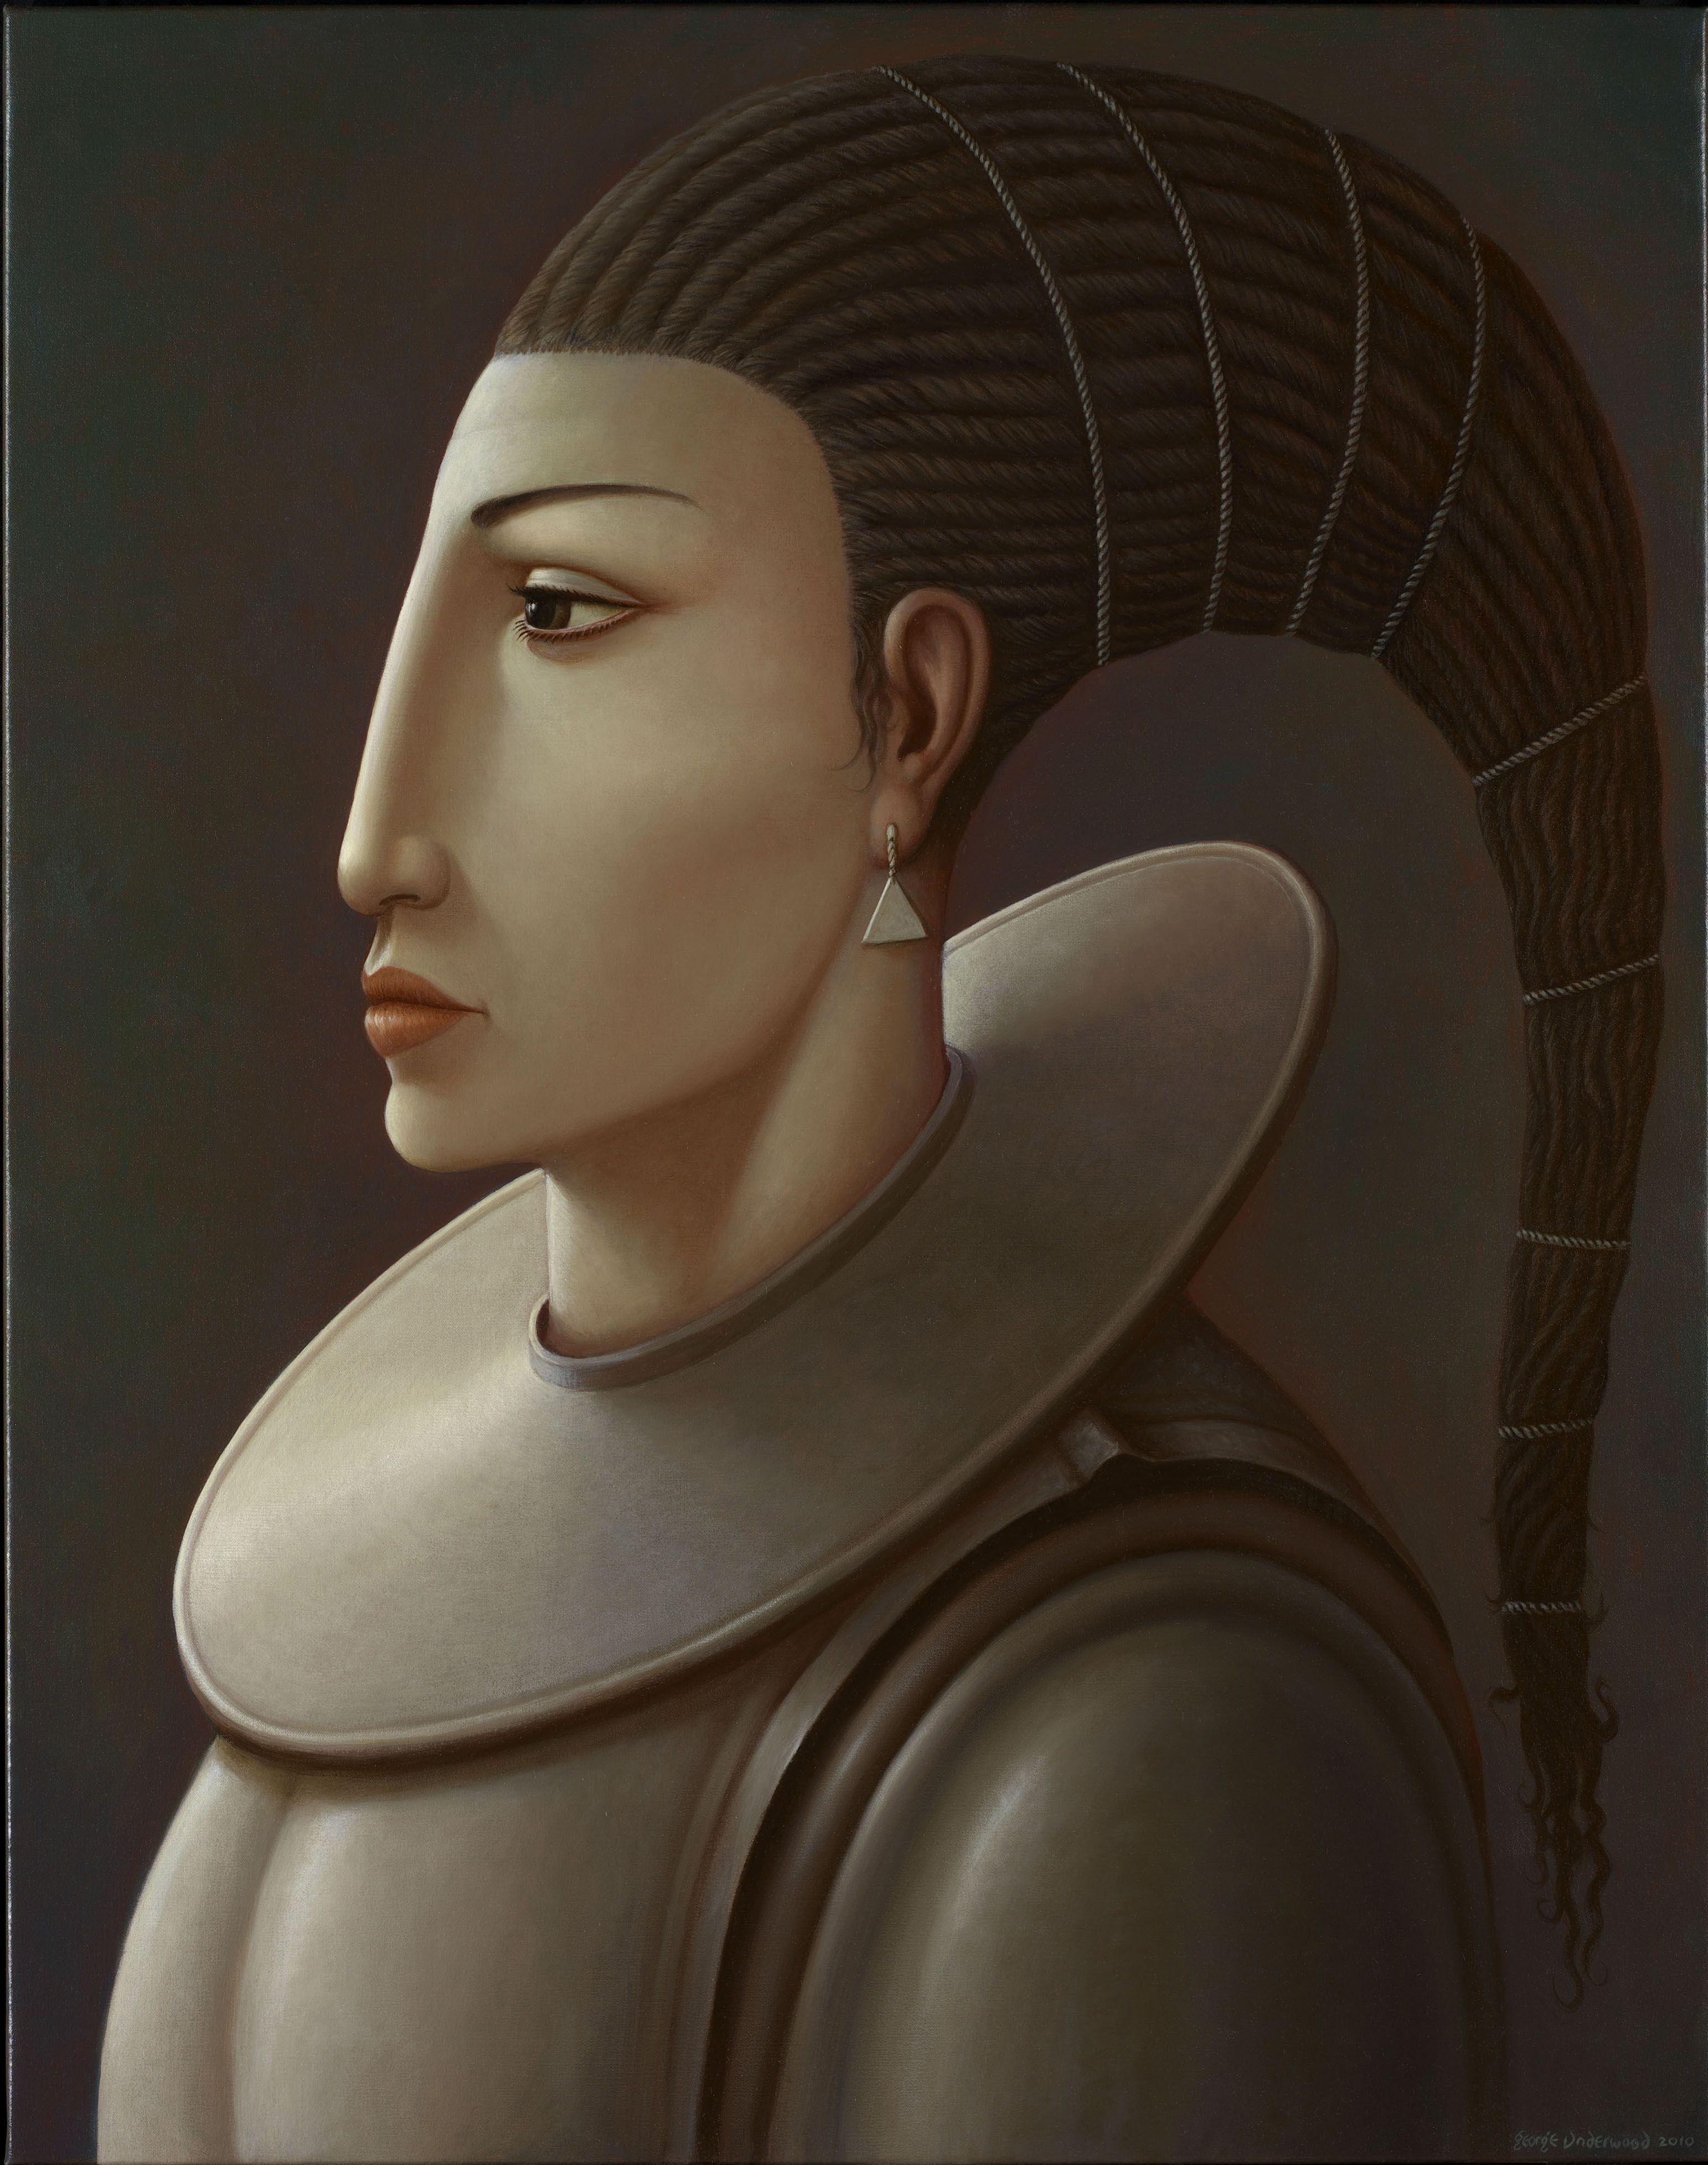 George Underwood - British Surrealist Painter - Girl With Triangular Earring